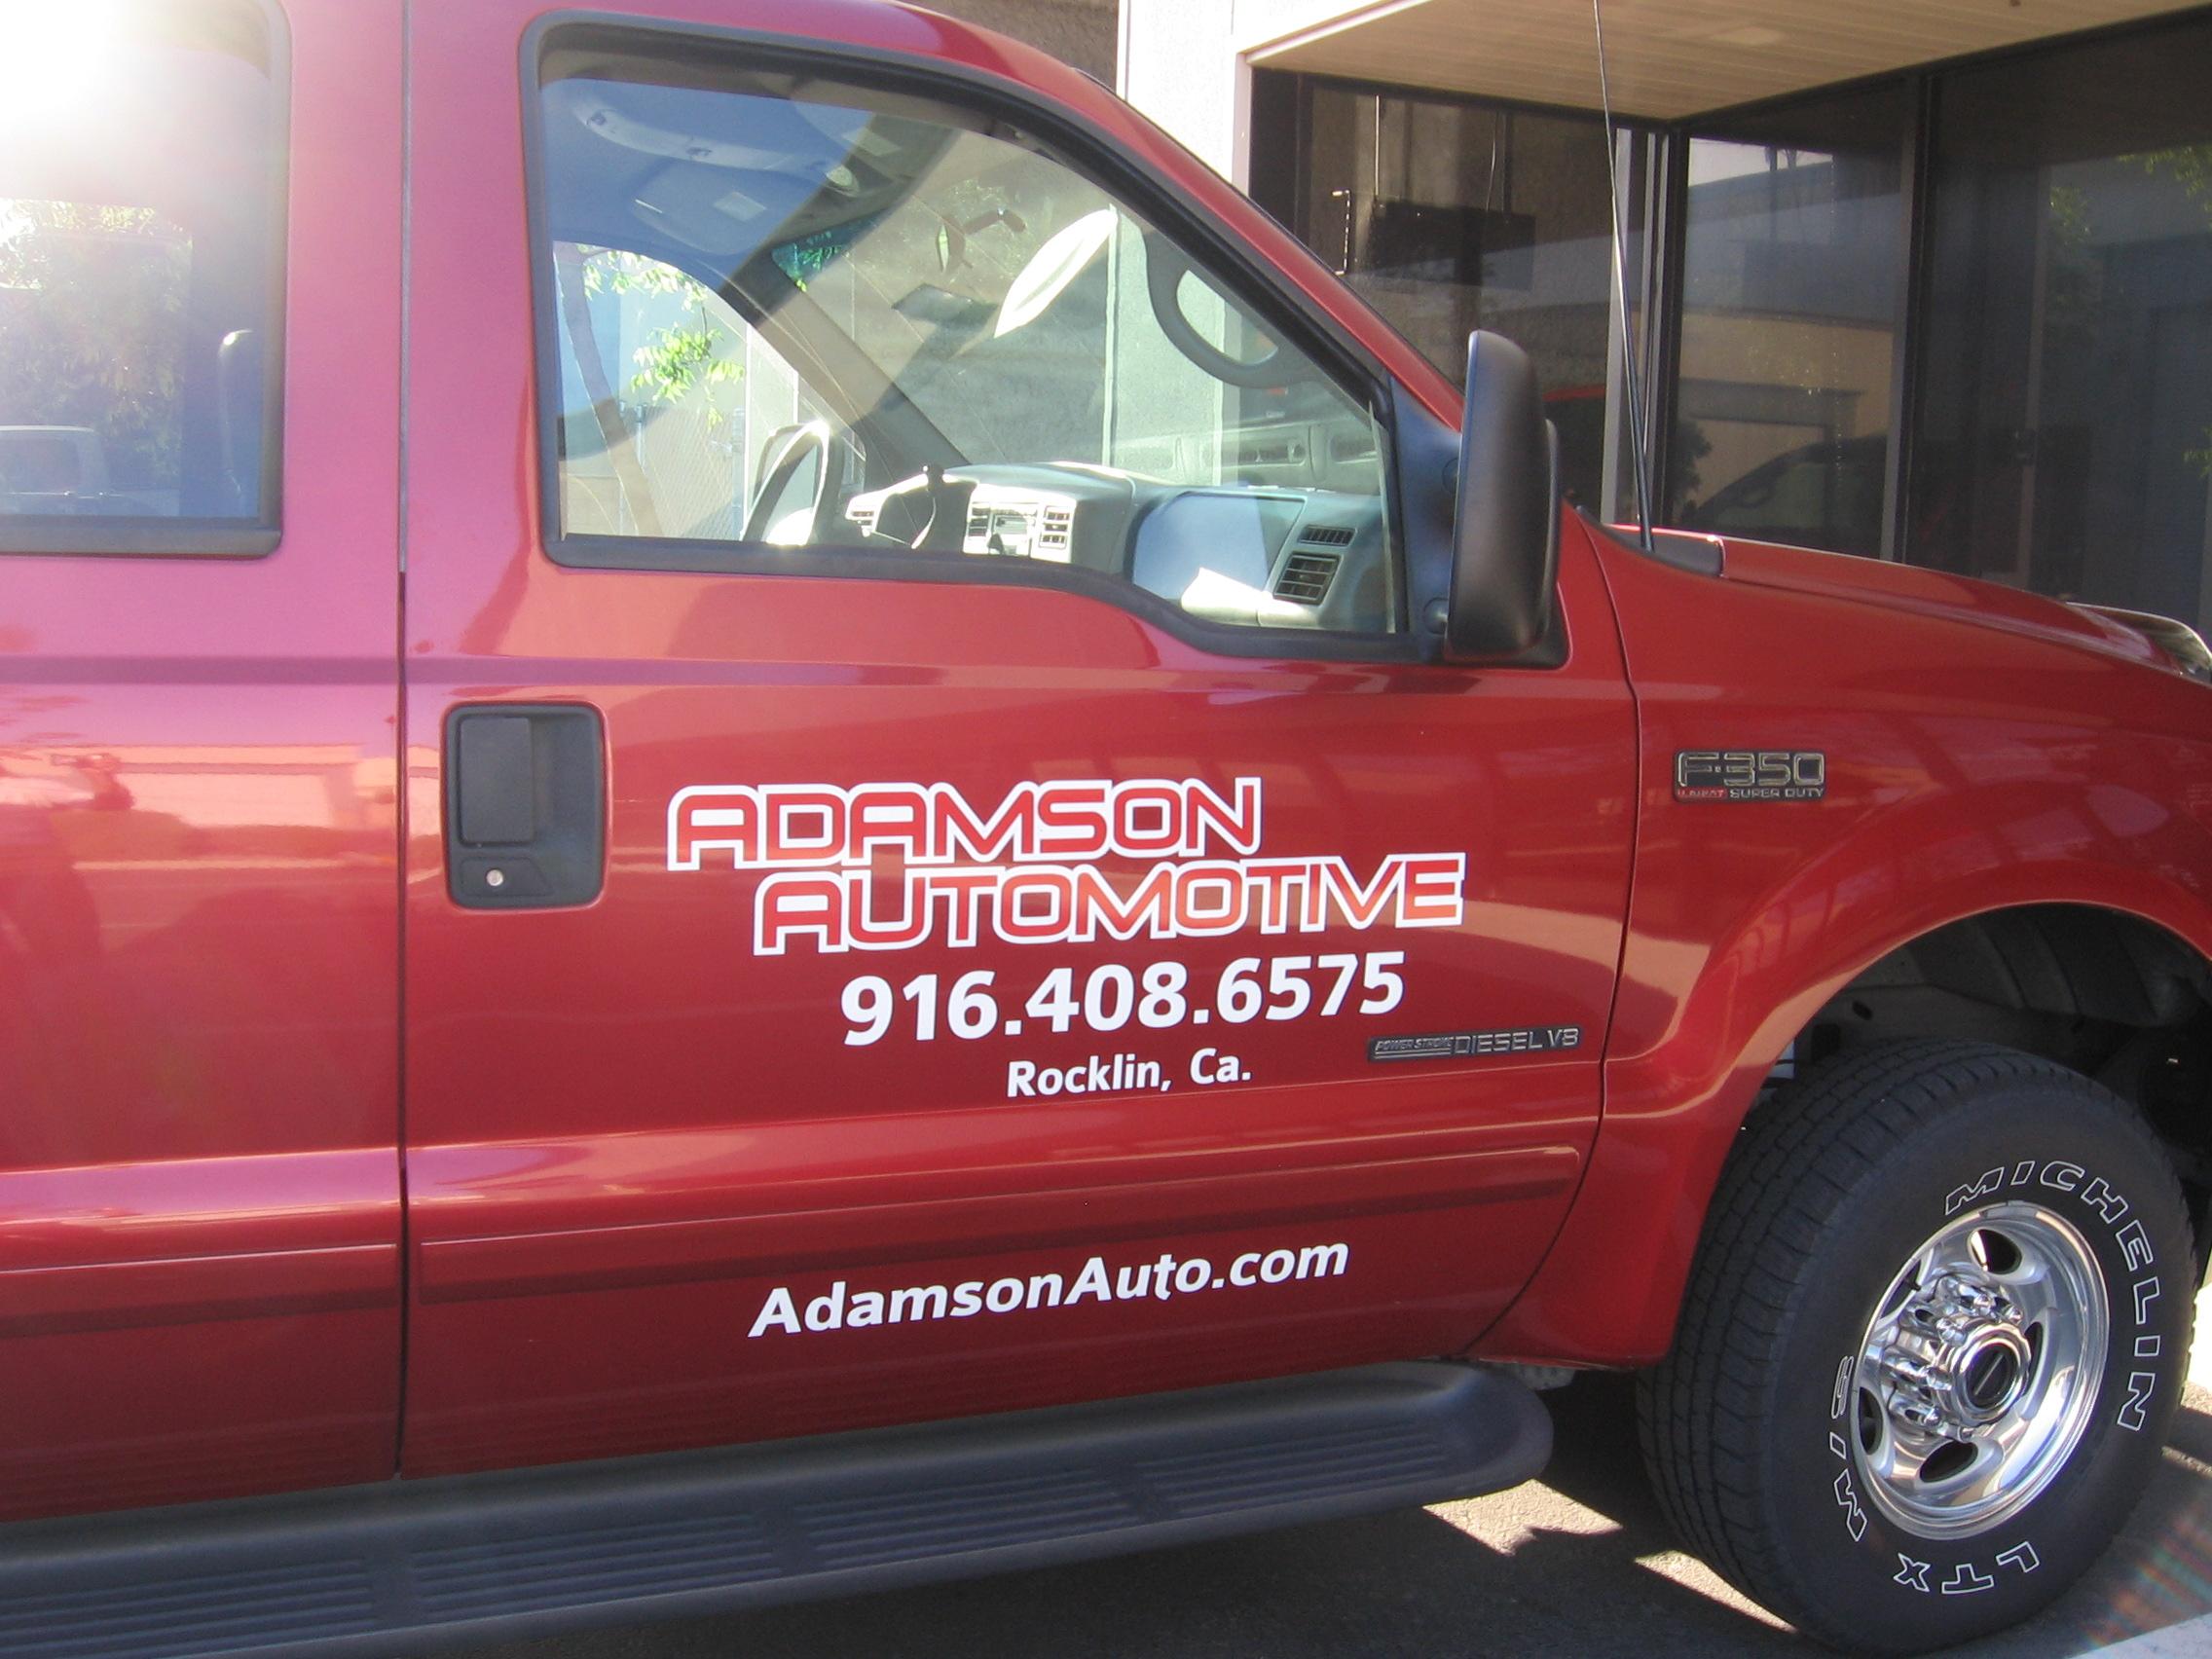 Adamson Automotive Truck||||